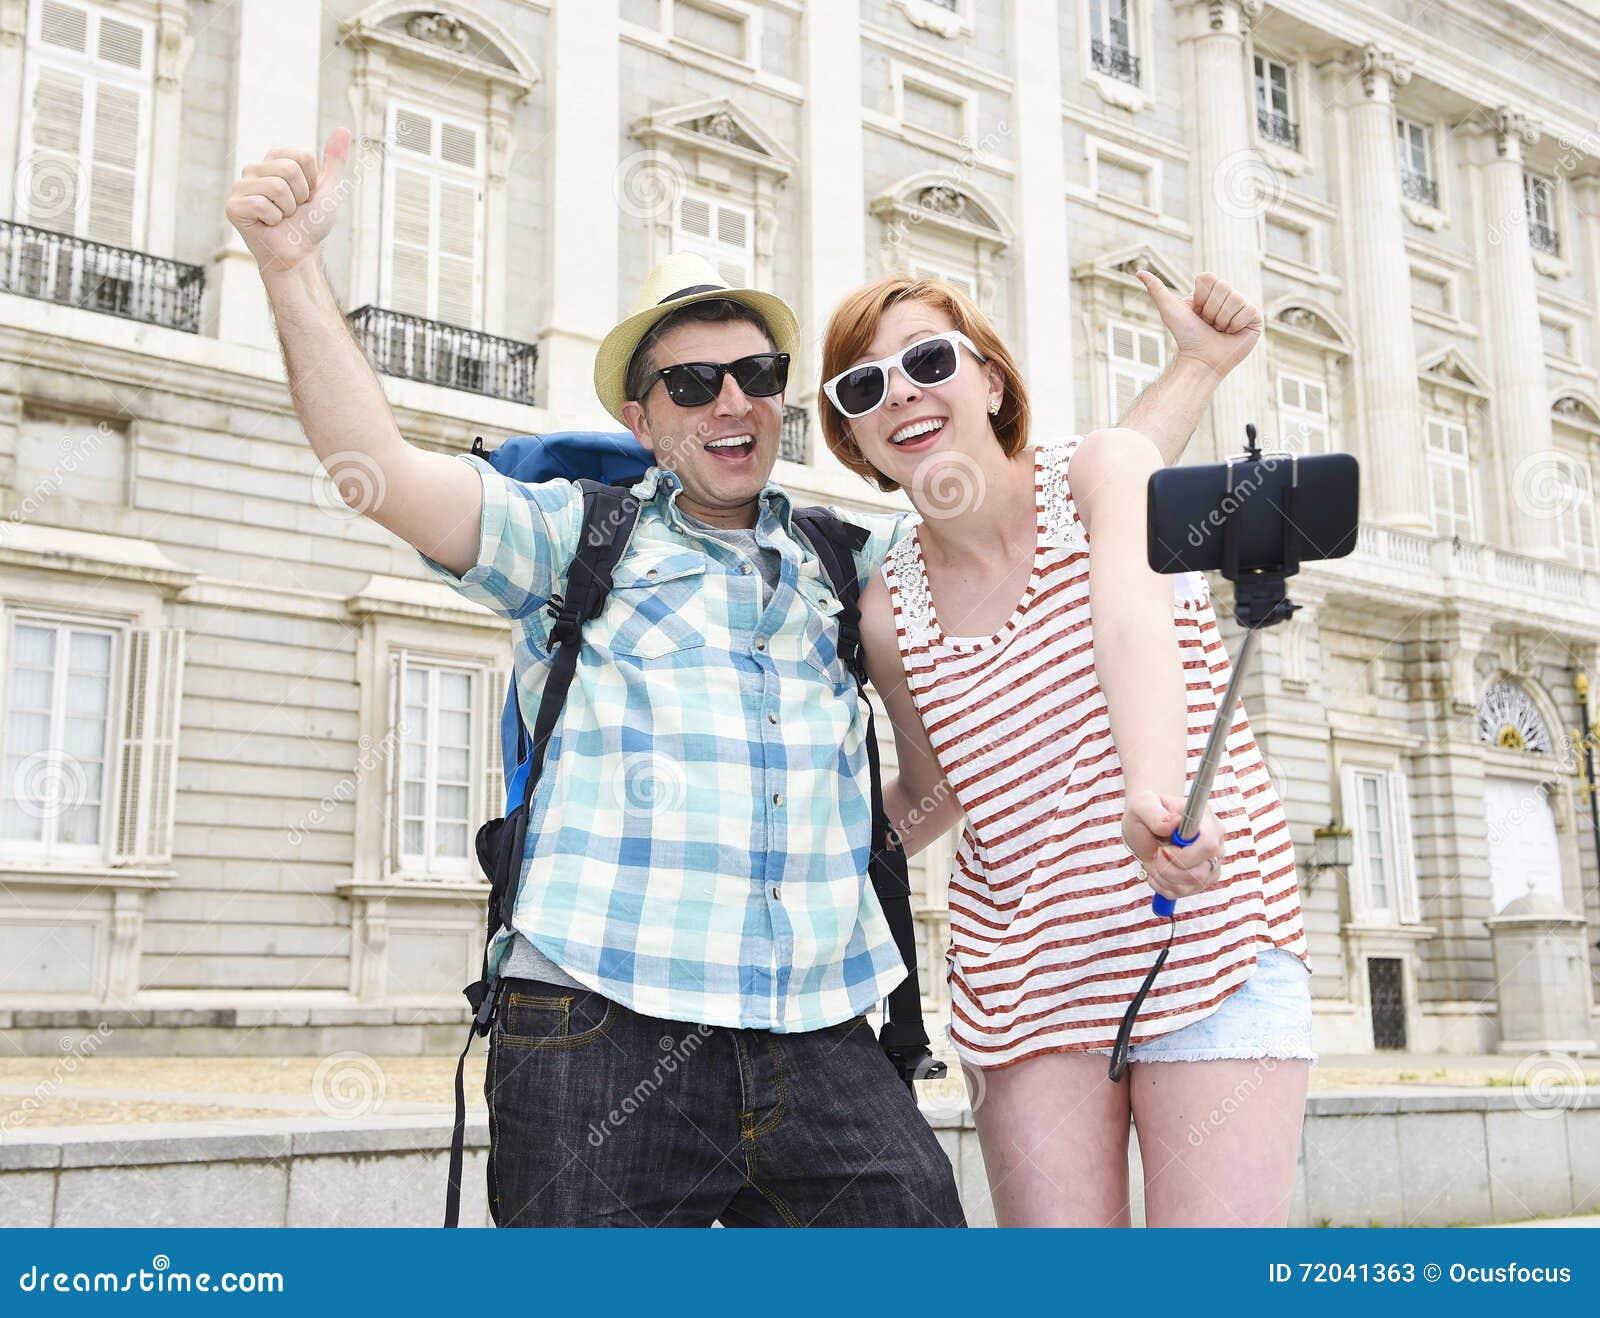 Couple Enjoying Their Summer Holidays Stock Photo: Young American Couple Enjoying Spain Holiday Trip Taking